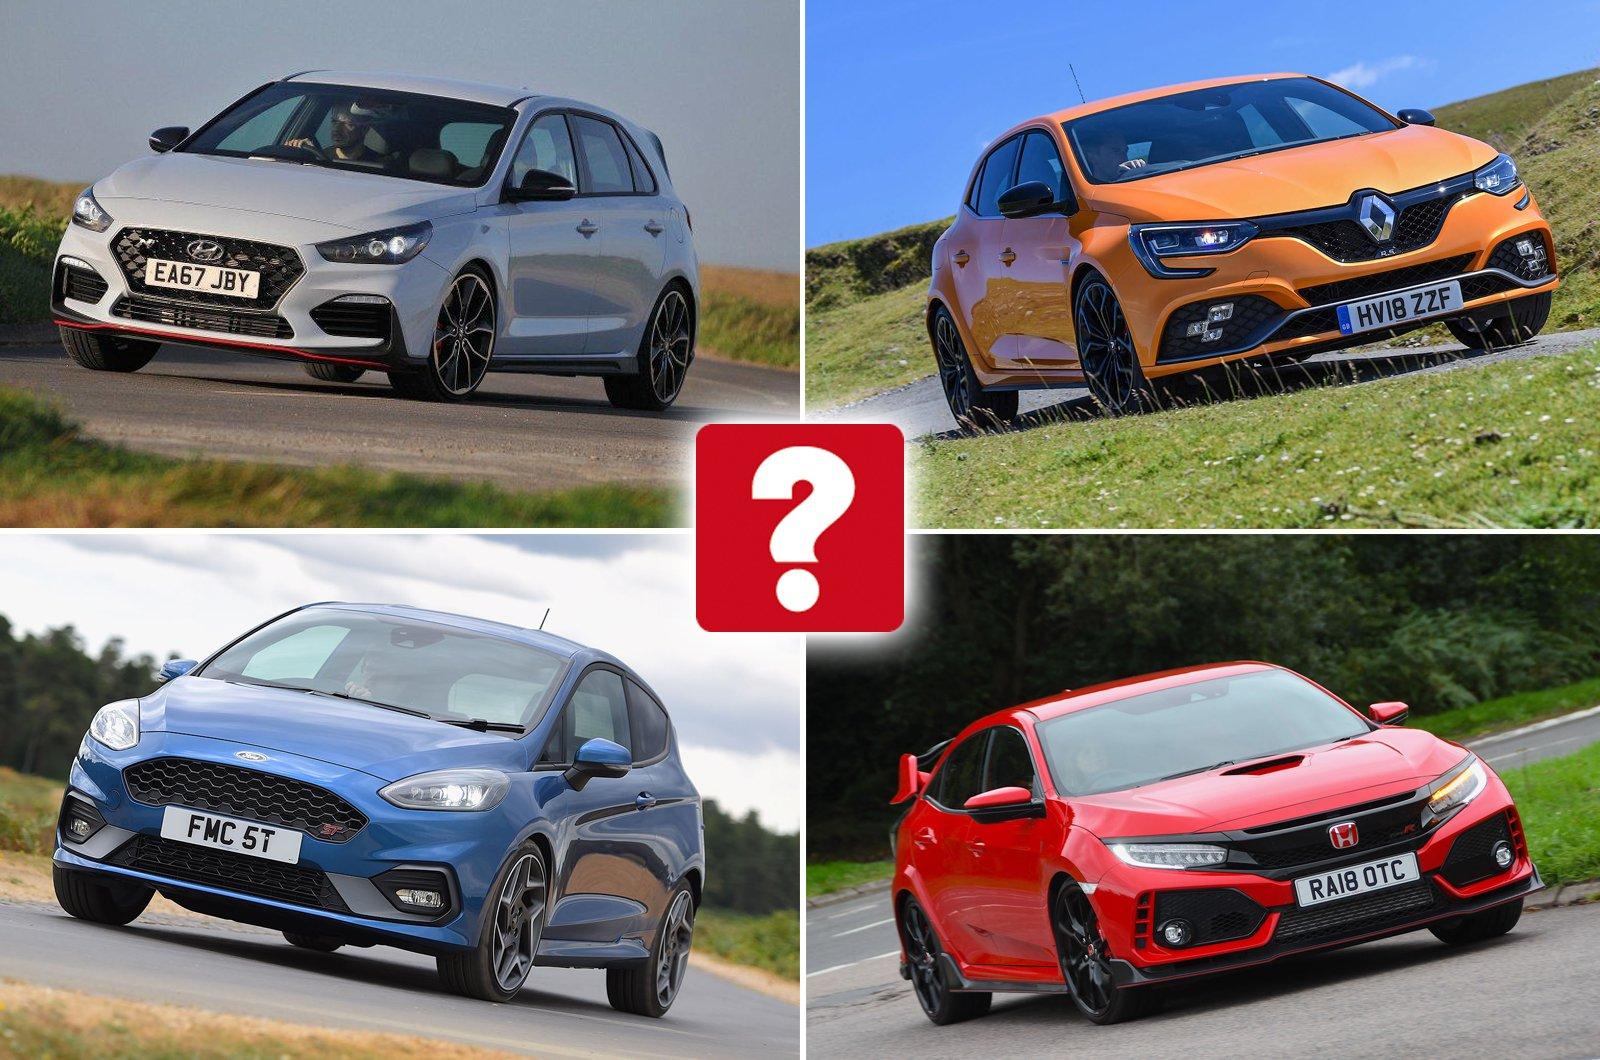 Hyundai i30N, Renault Megane RS, Ford Fiesta ST, Honda Civic Type R